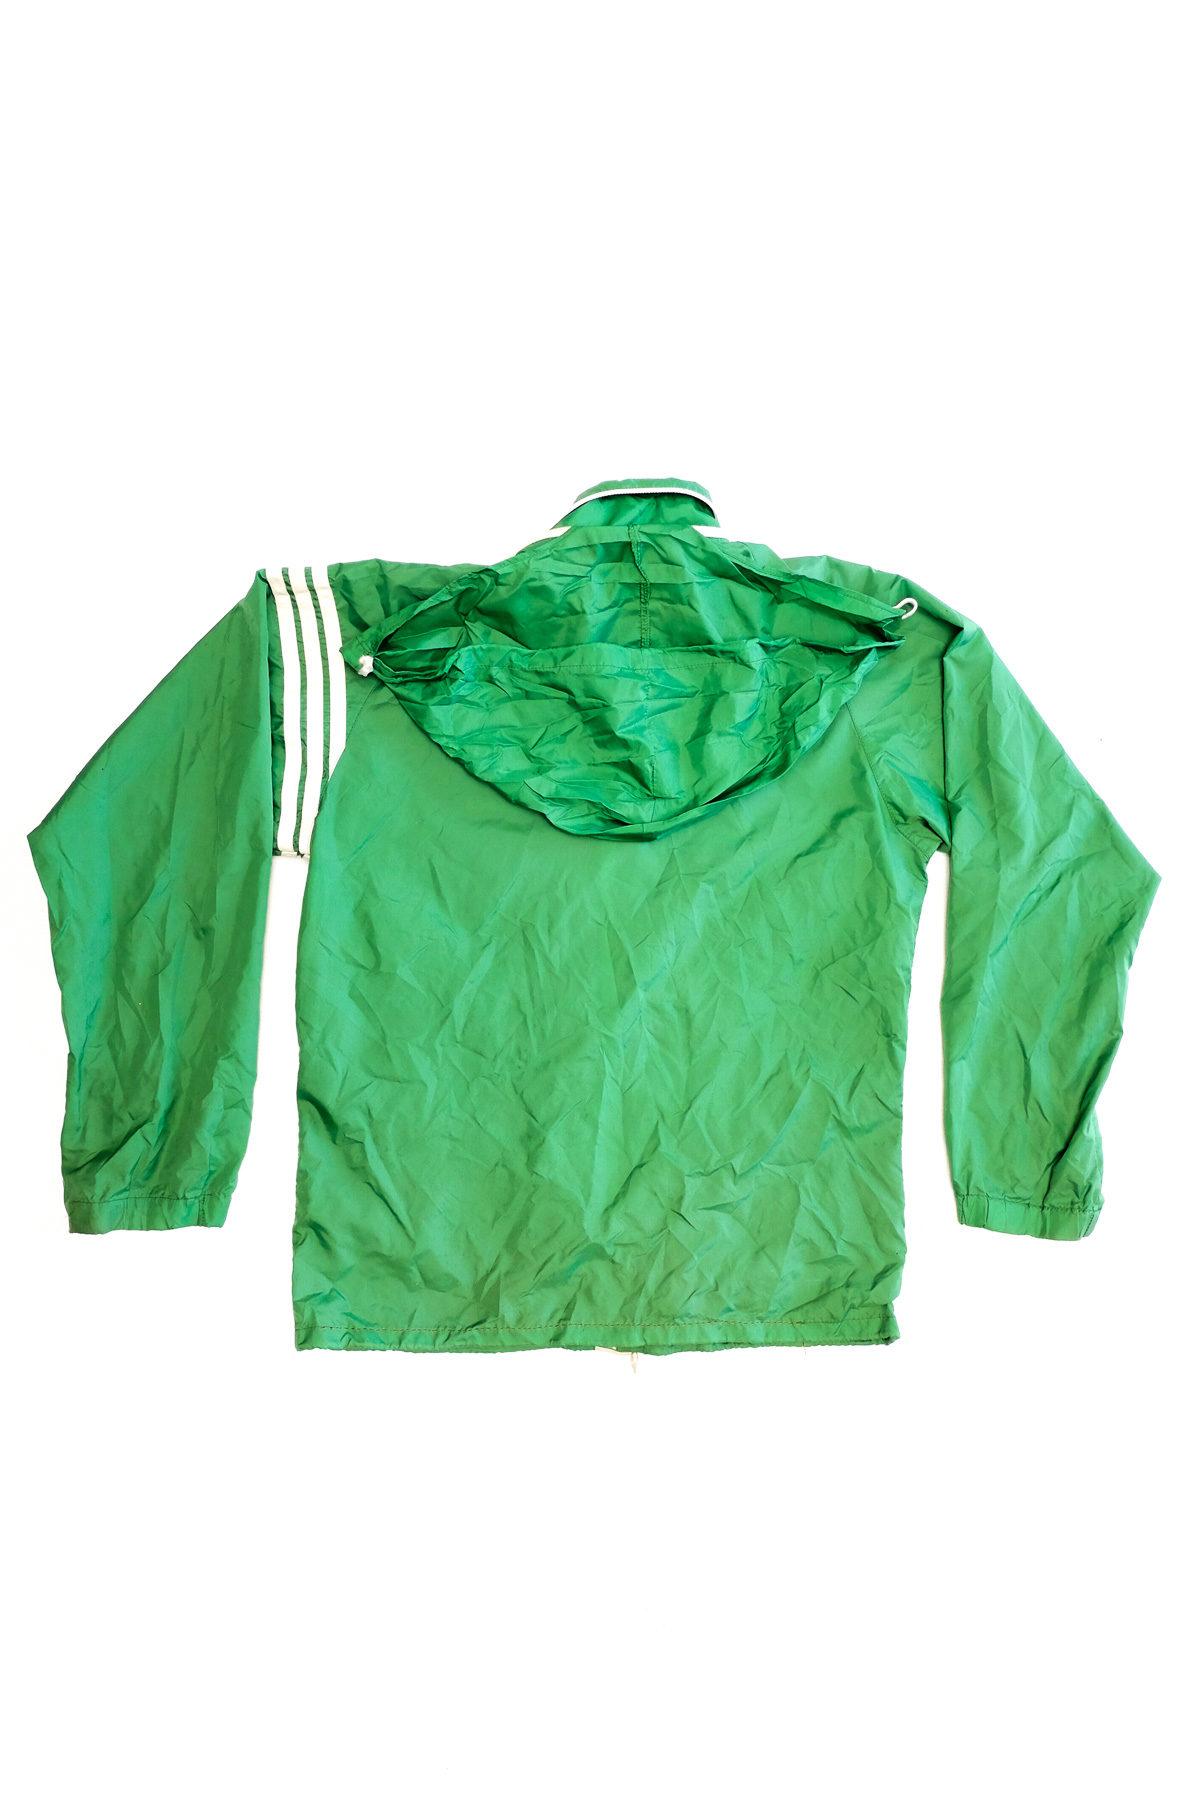 Adidas GIUBBINO VINTAGE Green